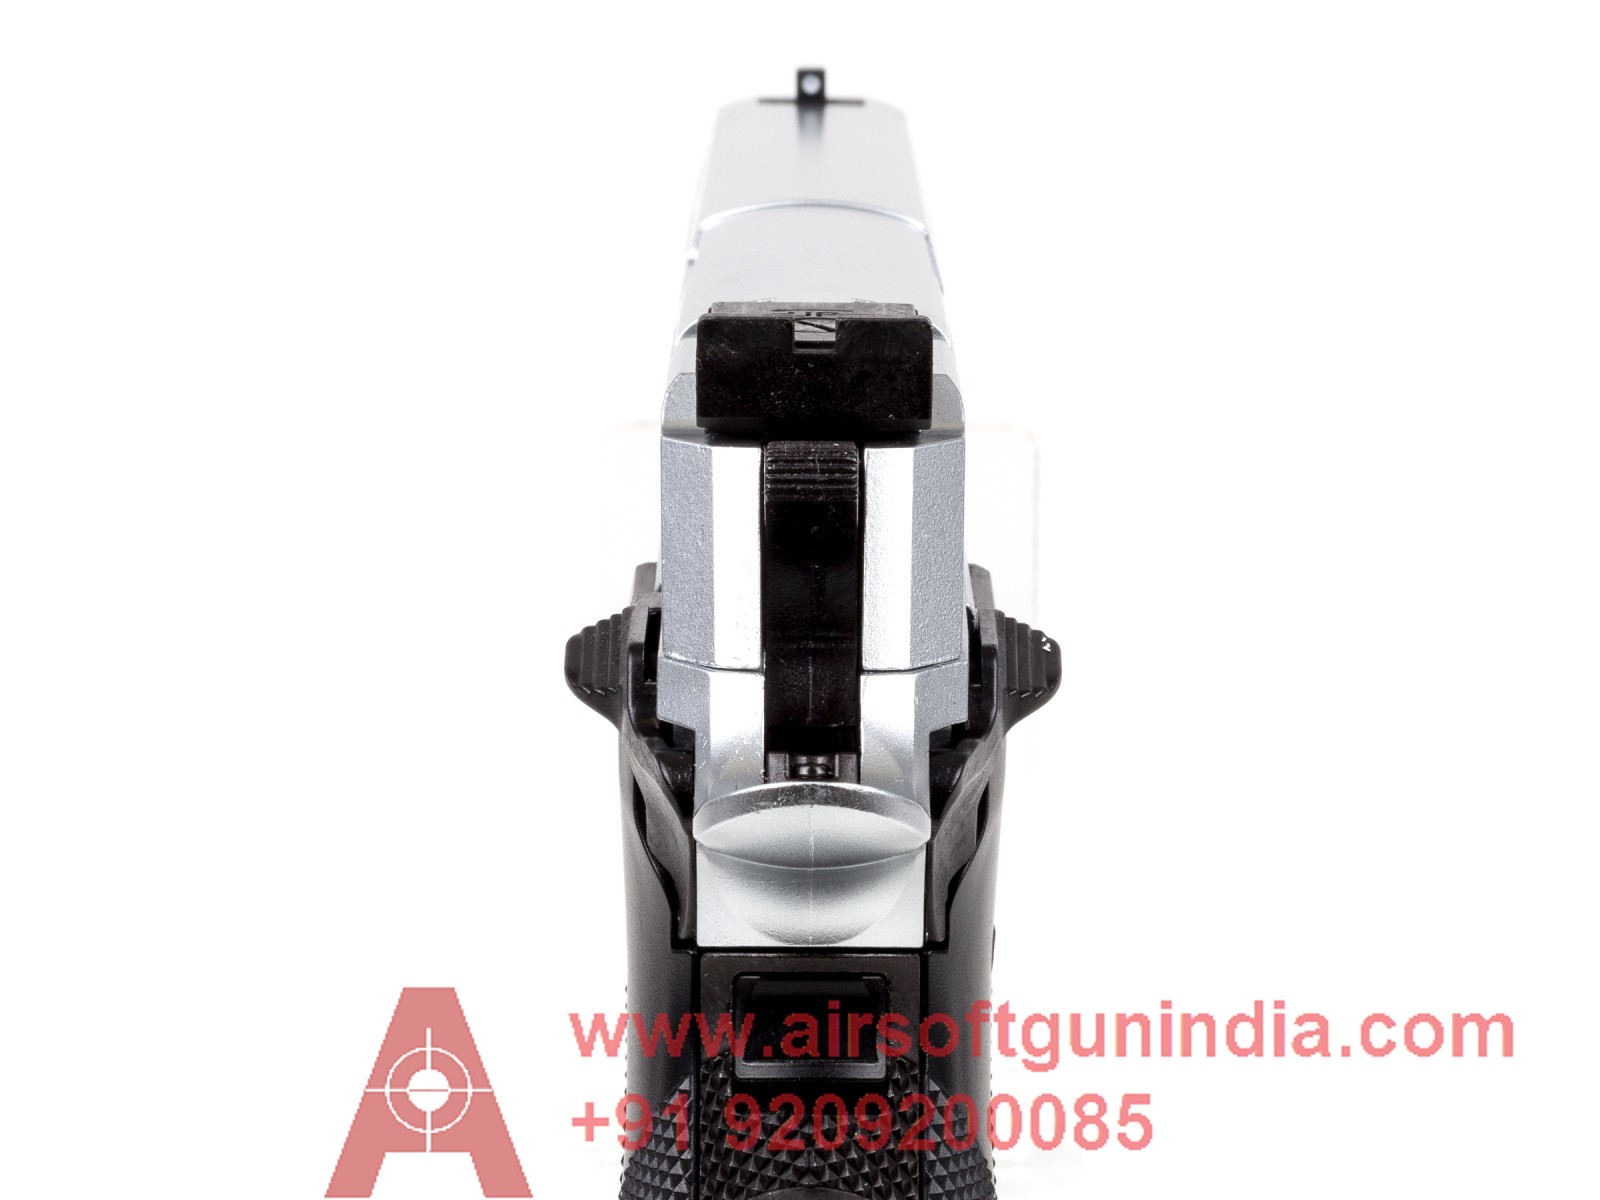 Sig Sauer X-Five ASP CO2 Pellet Pistol, Silver By Airsoft Gun India